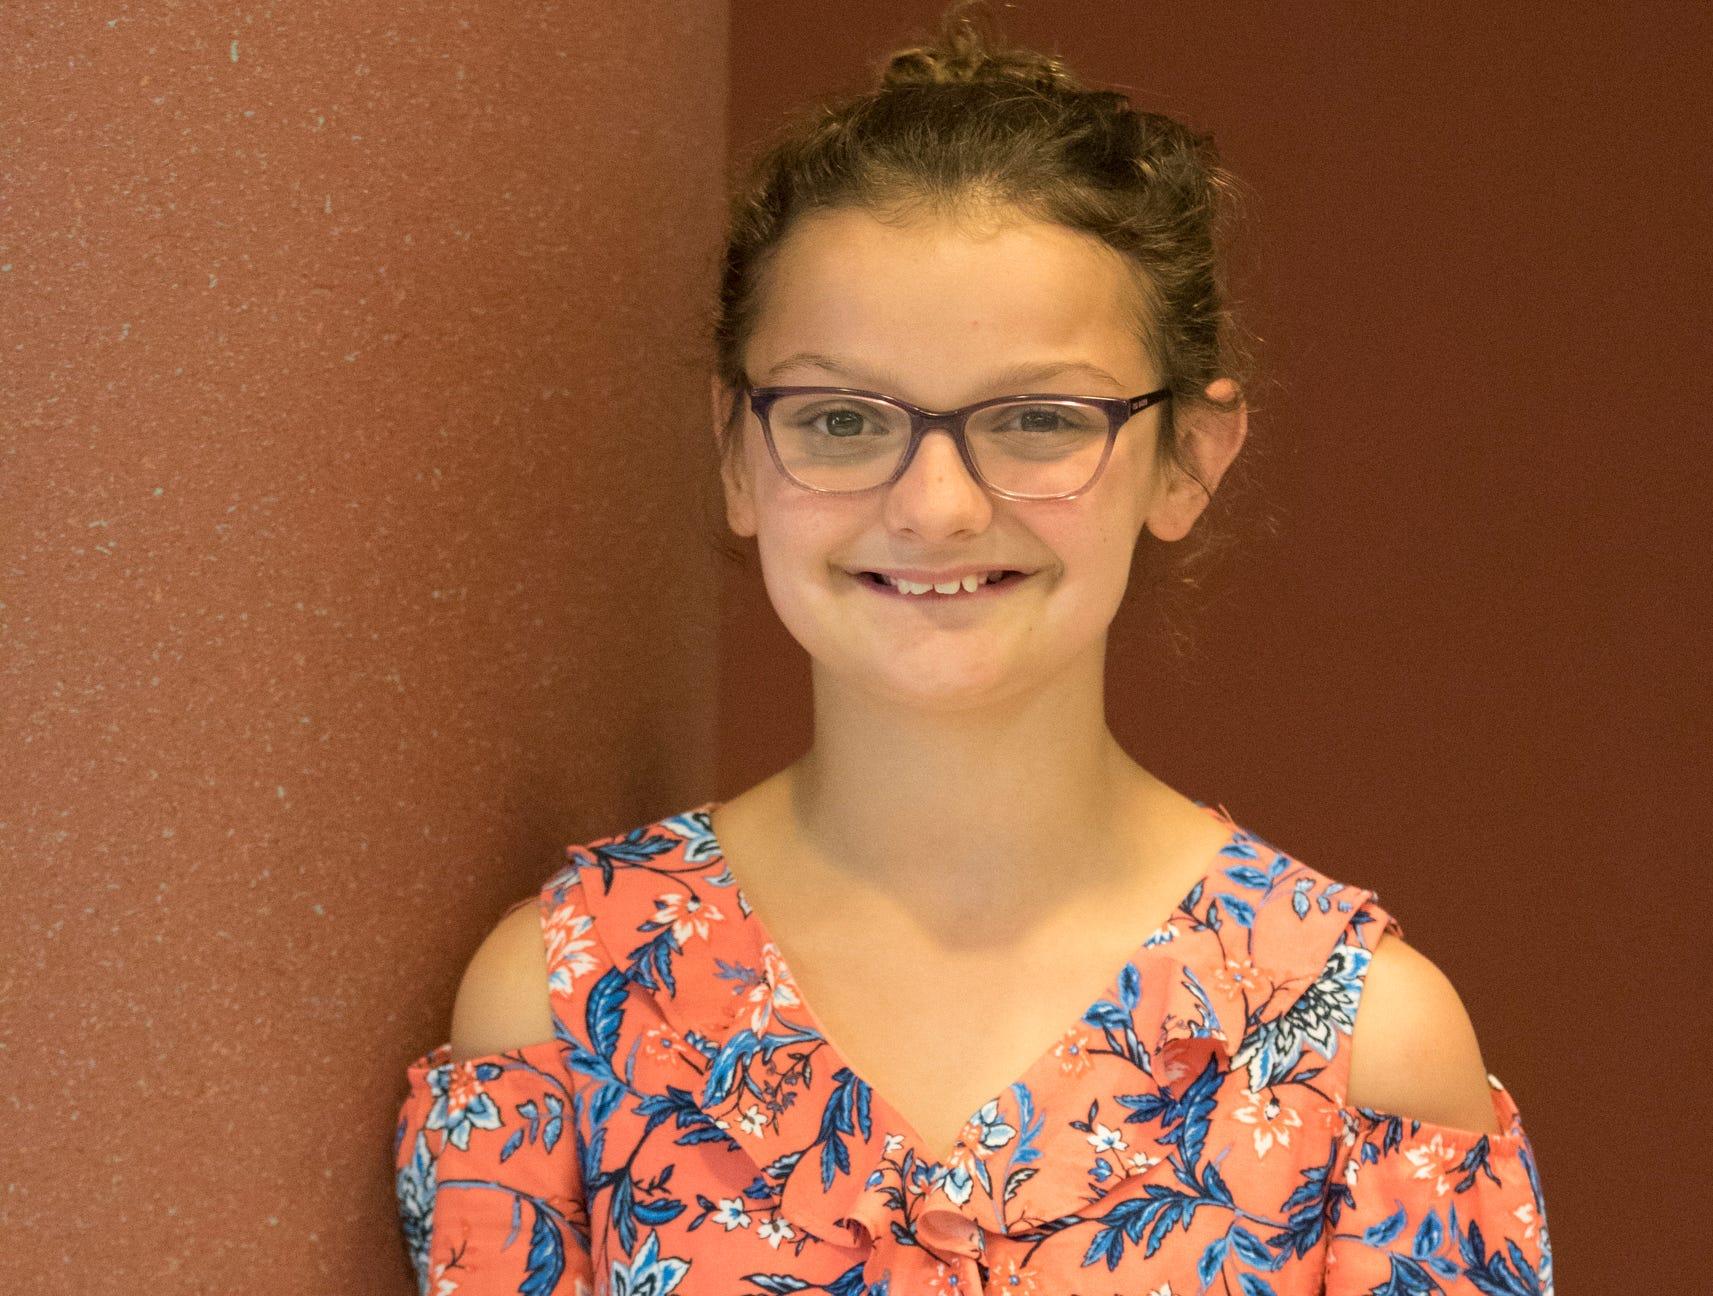 Ella Pelfrey, 10, Panther Power. Project: Veterinary Science